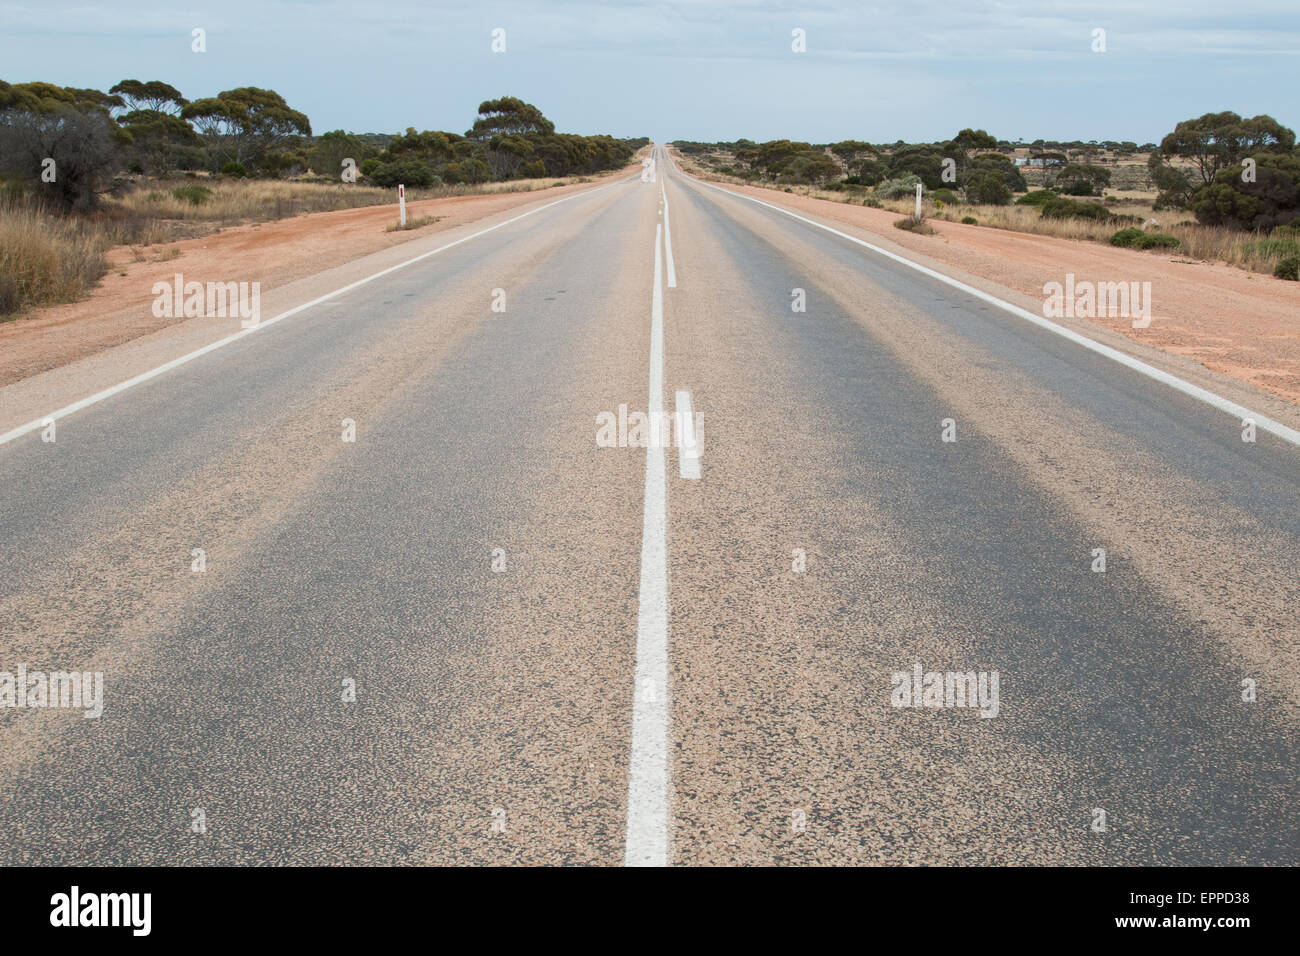 the start of the longest straight road in Australia - 150km to the next corner, Nullabor desert, Western Australia - Stock Image